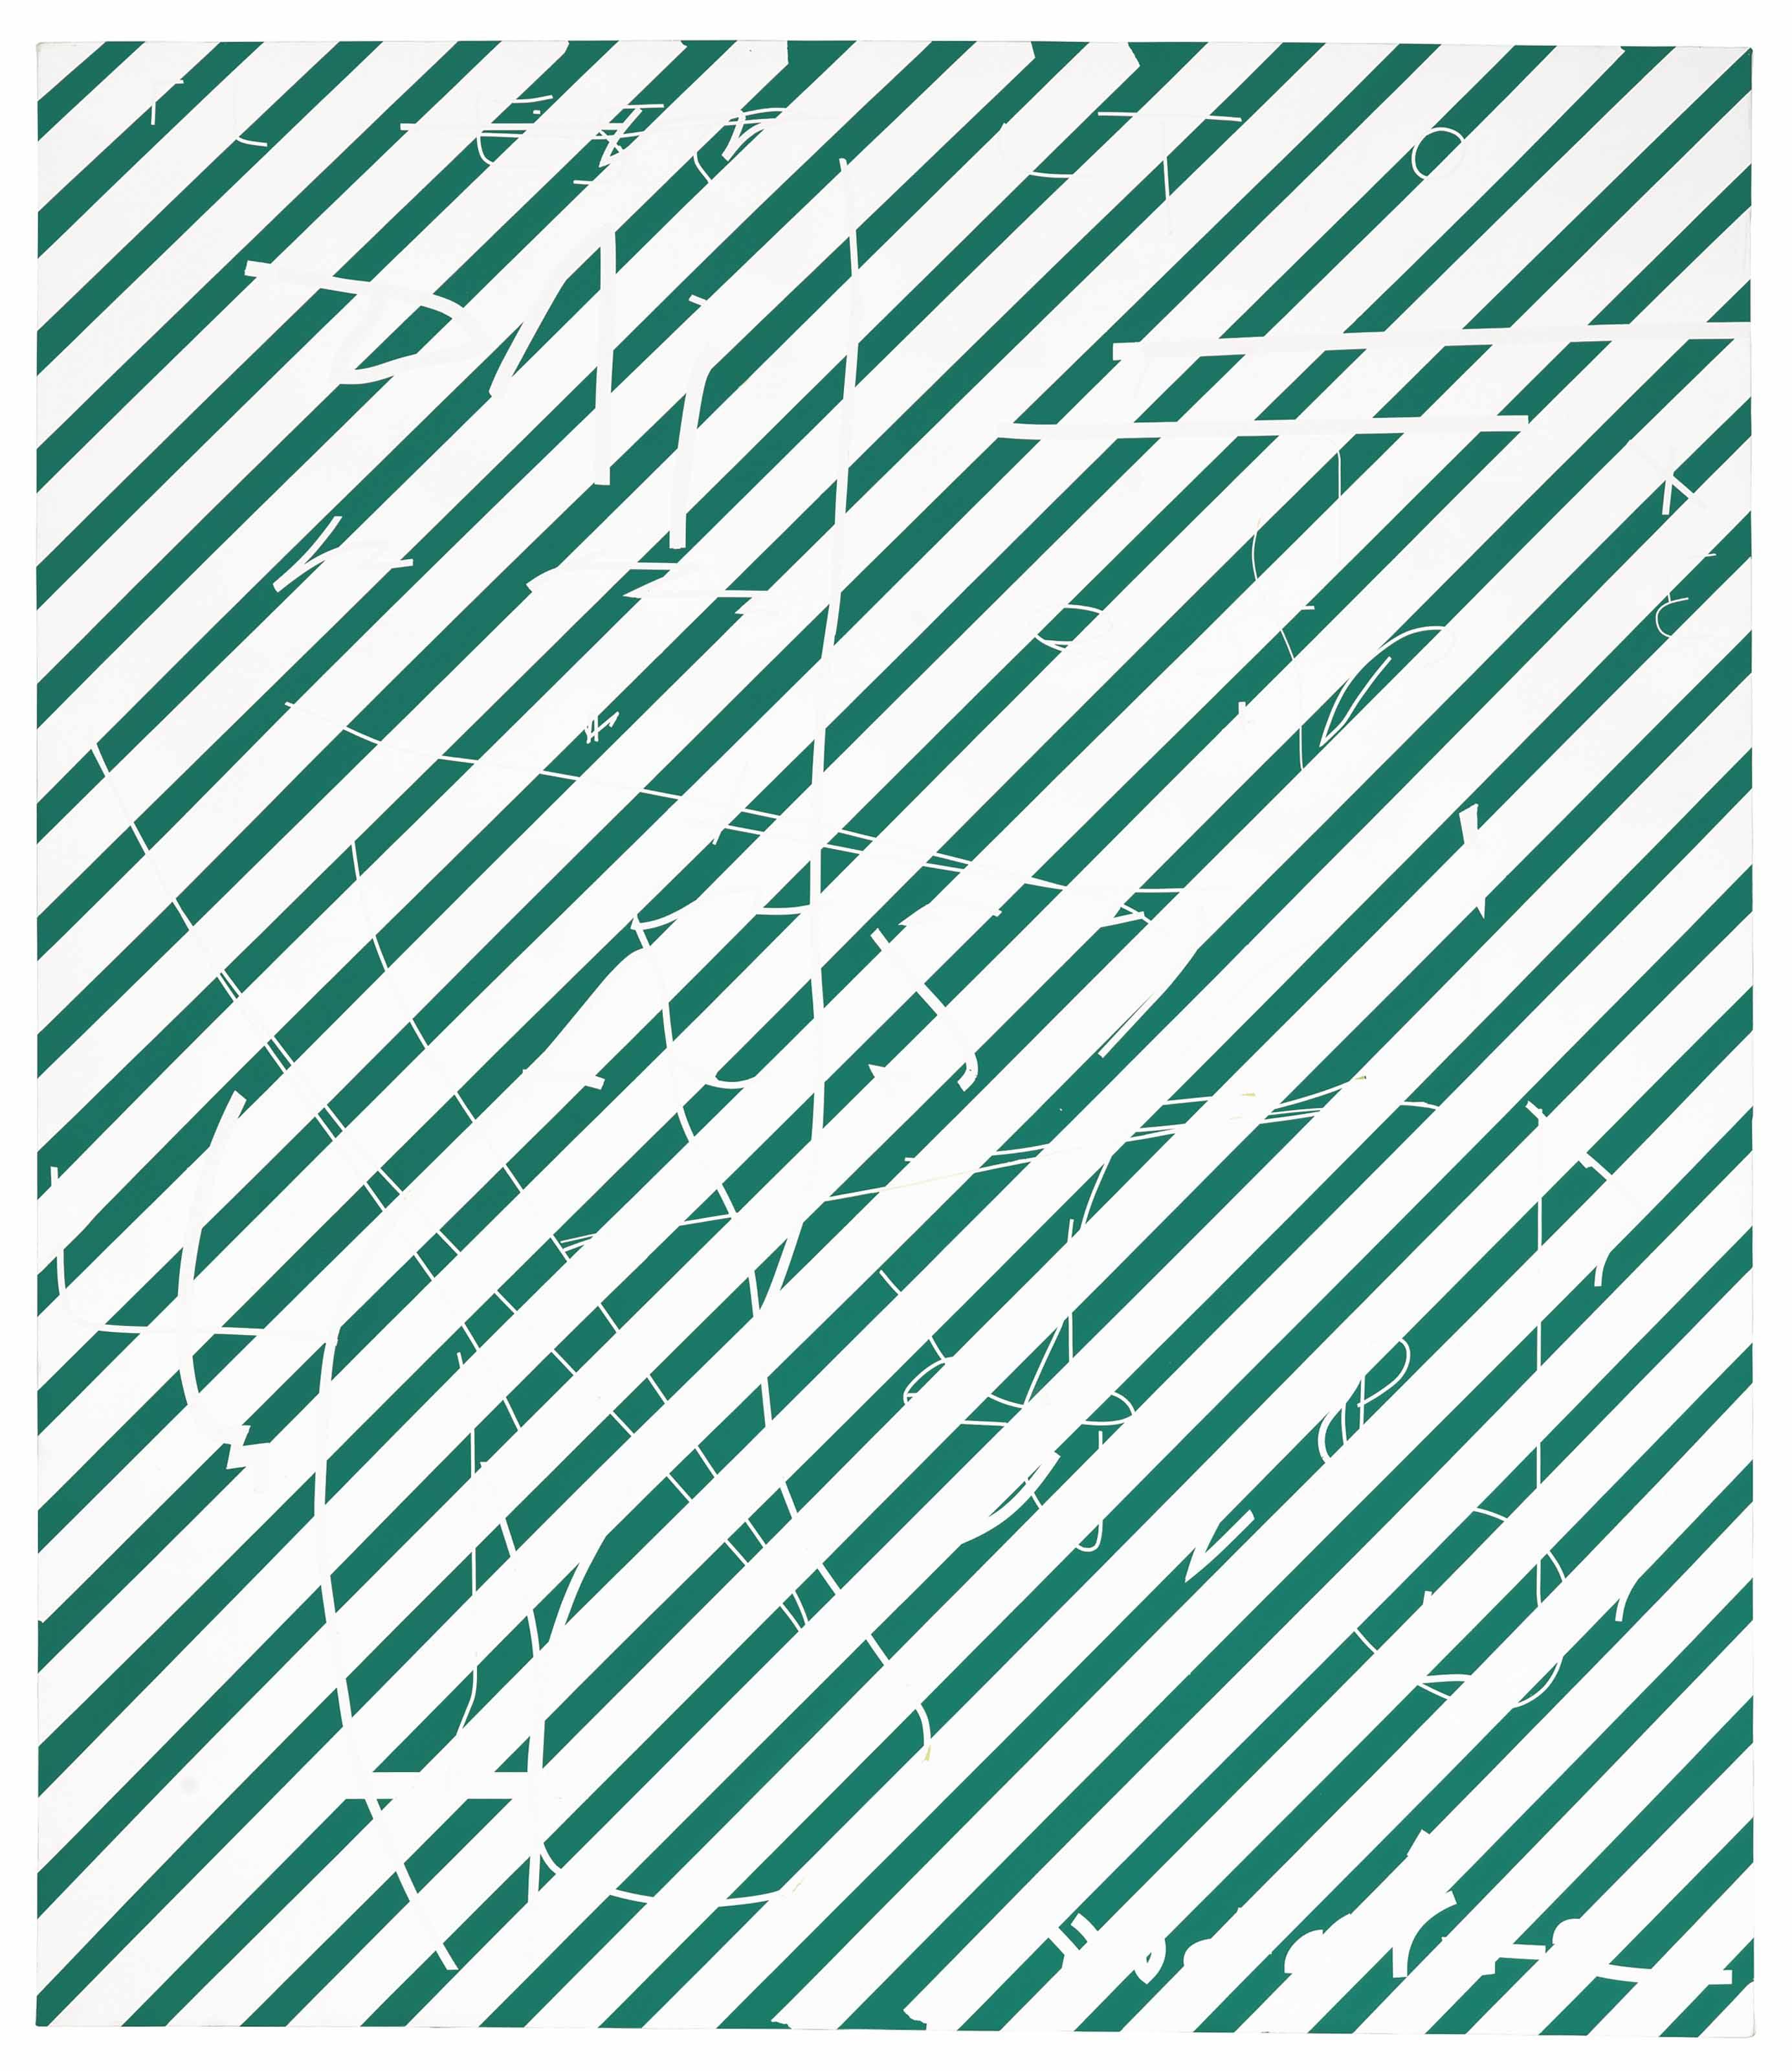 Green Stripe Rodarte